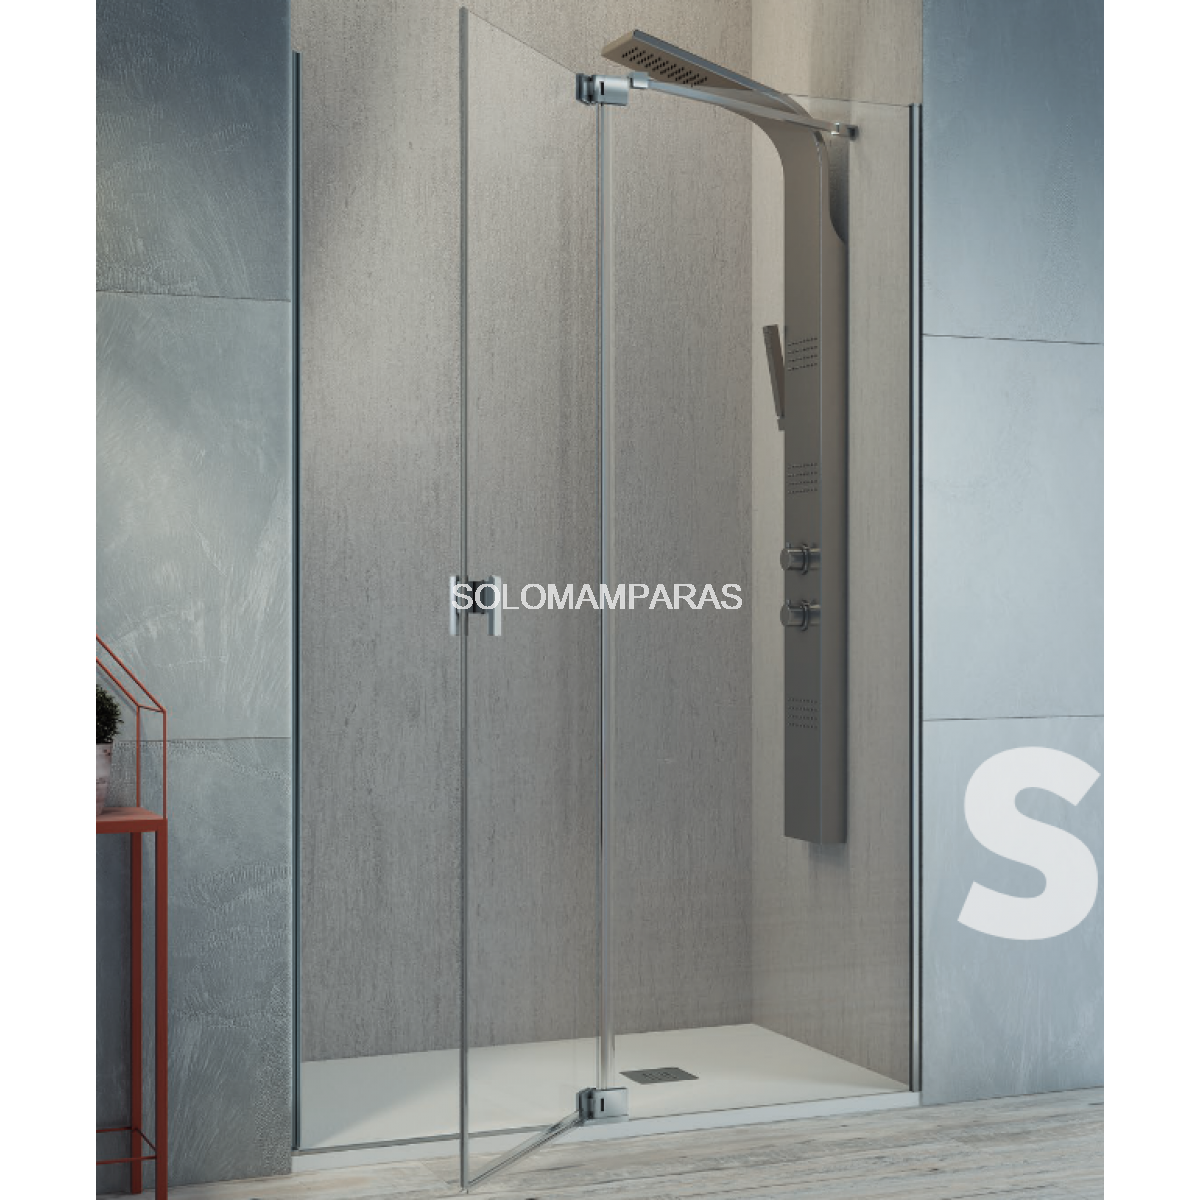 Mamparas De Bano Kassandra Madrid.Mampara De Ducha Kassandra Sula Sl603 Sl602 Transparente Antical Easy Clean 1 Fija 1 Abatible Con Lateral Fijo Opcional